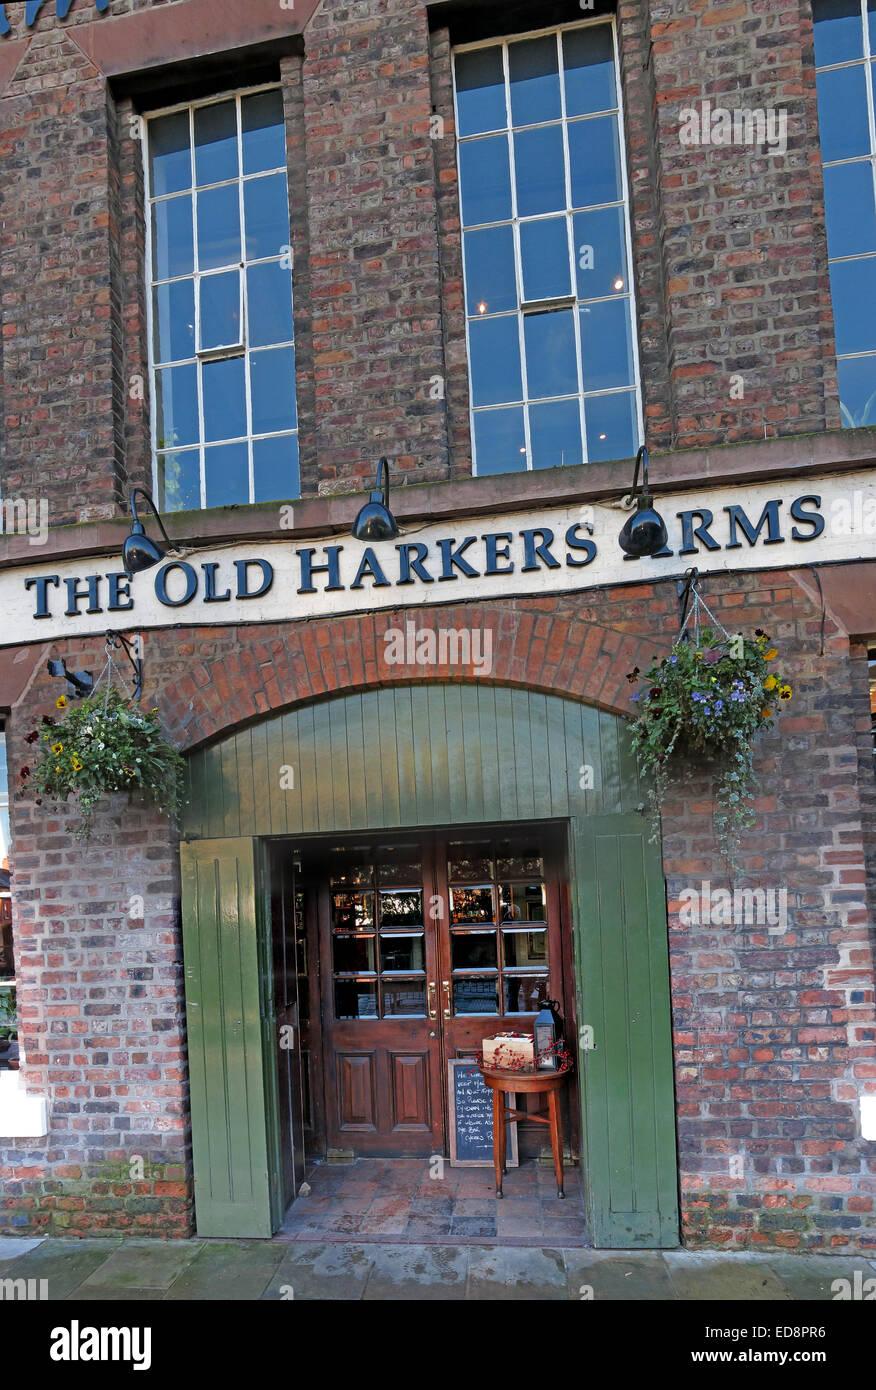 Laden Sie dieses Alamy Stockfoto Die alten Harkers Arme Canalside, Stadt Chester, England, UK - ED8PR6